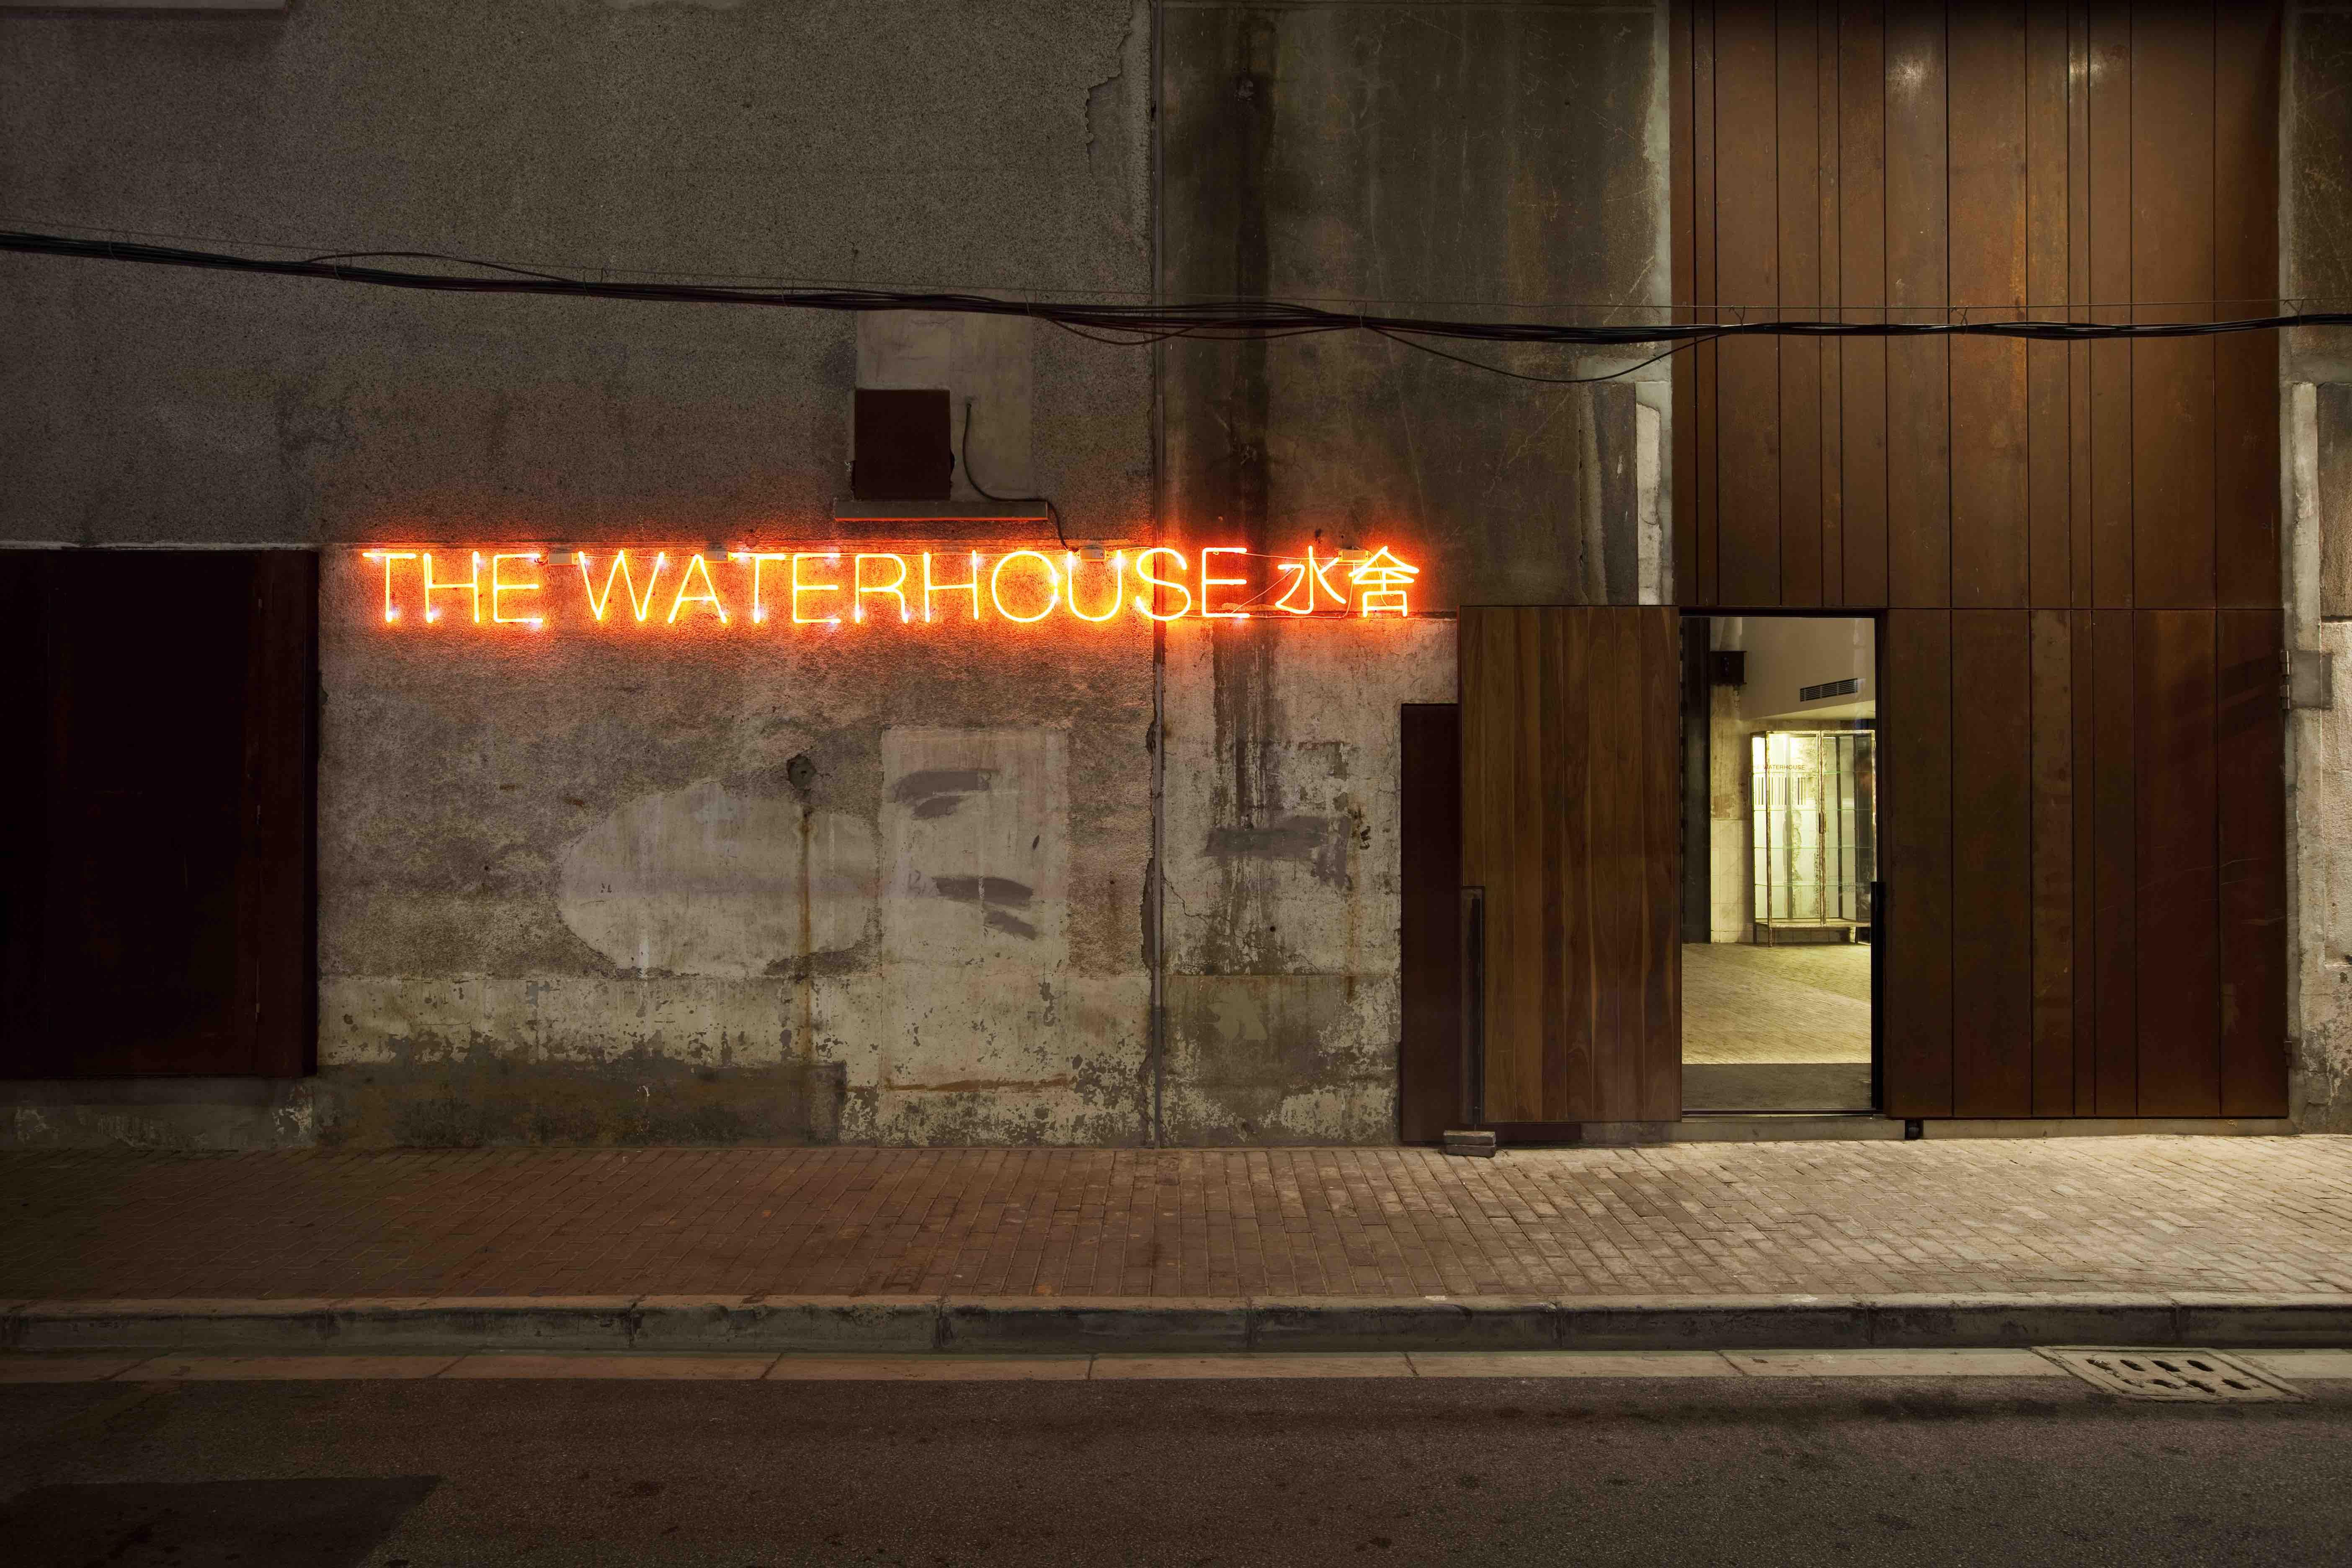 Designhotel Waterhouse Shanghai : The waterhouse at south bund neri hu design and research office